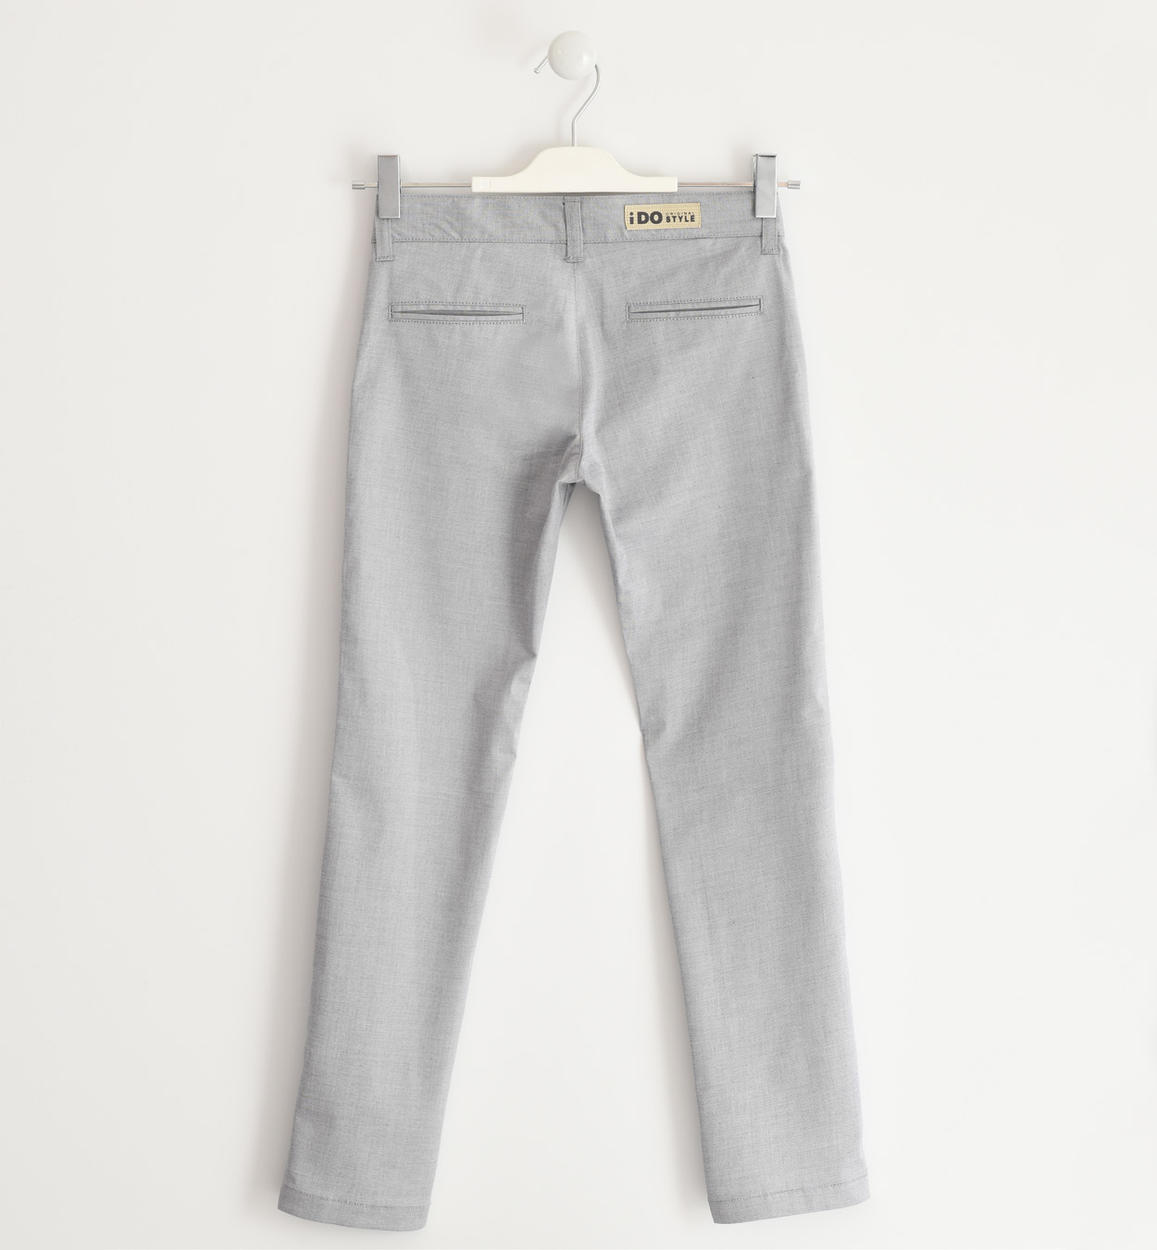 elegante e fresco pantalone per bambino grigio retro 02 2524j42100 0516 150x150